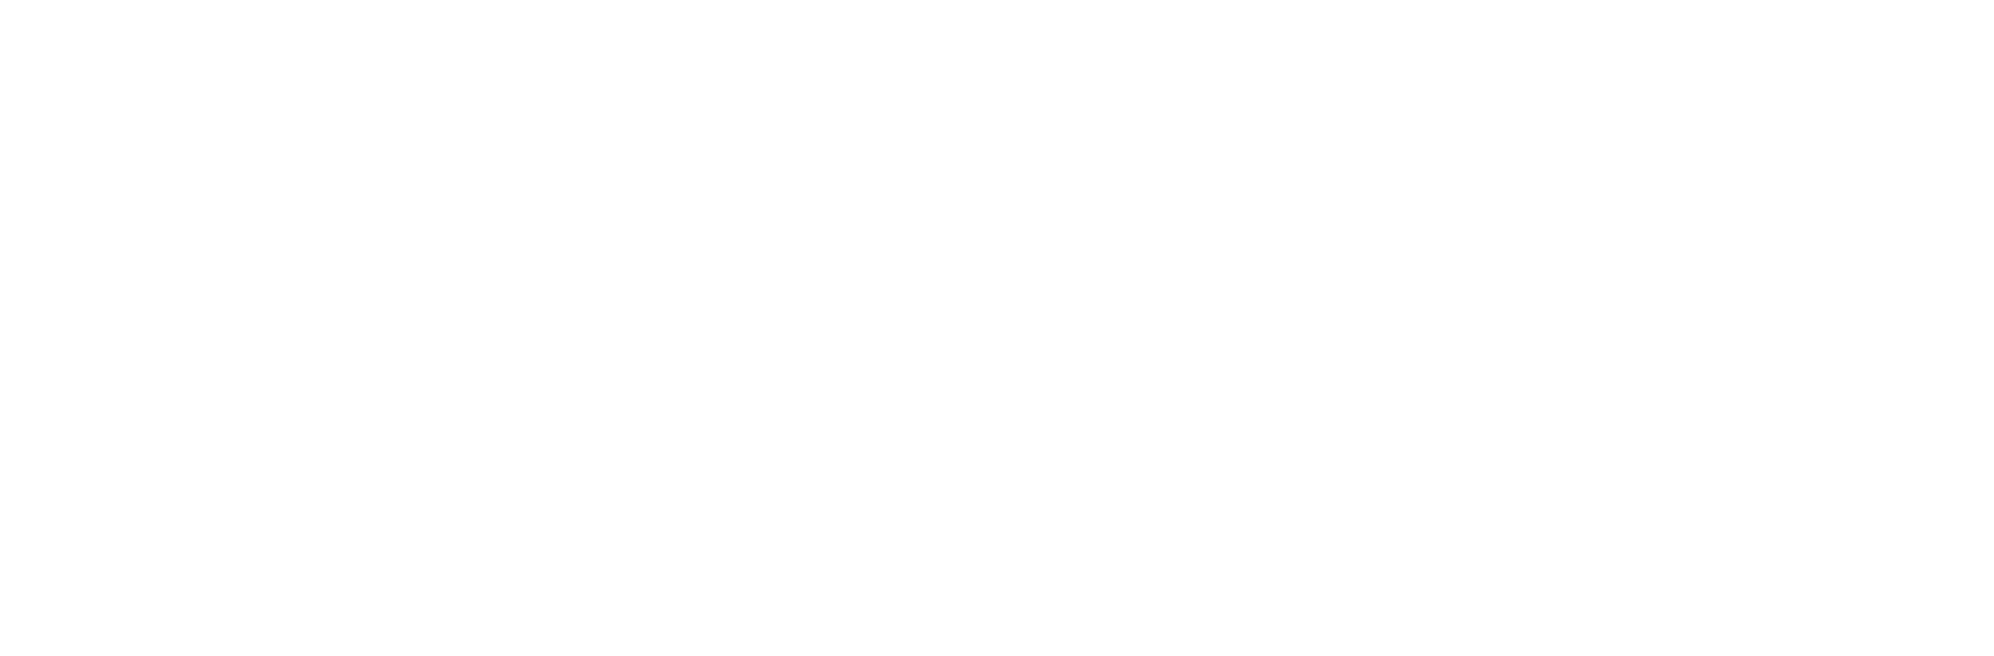 BNI Dynamique Premium